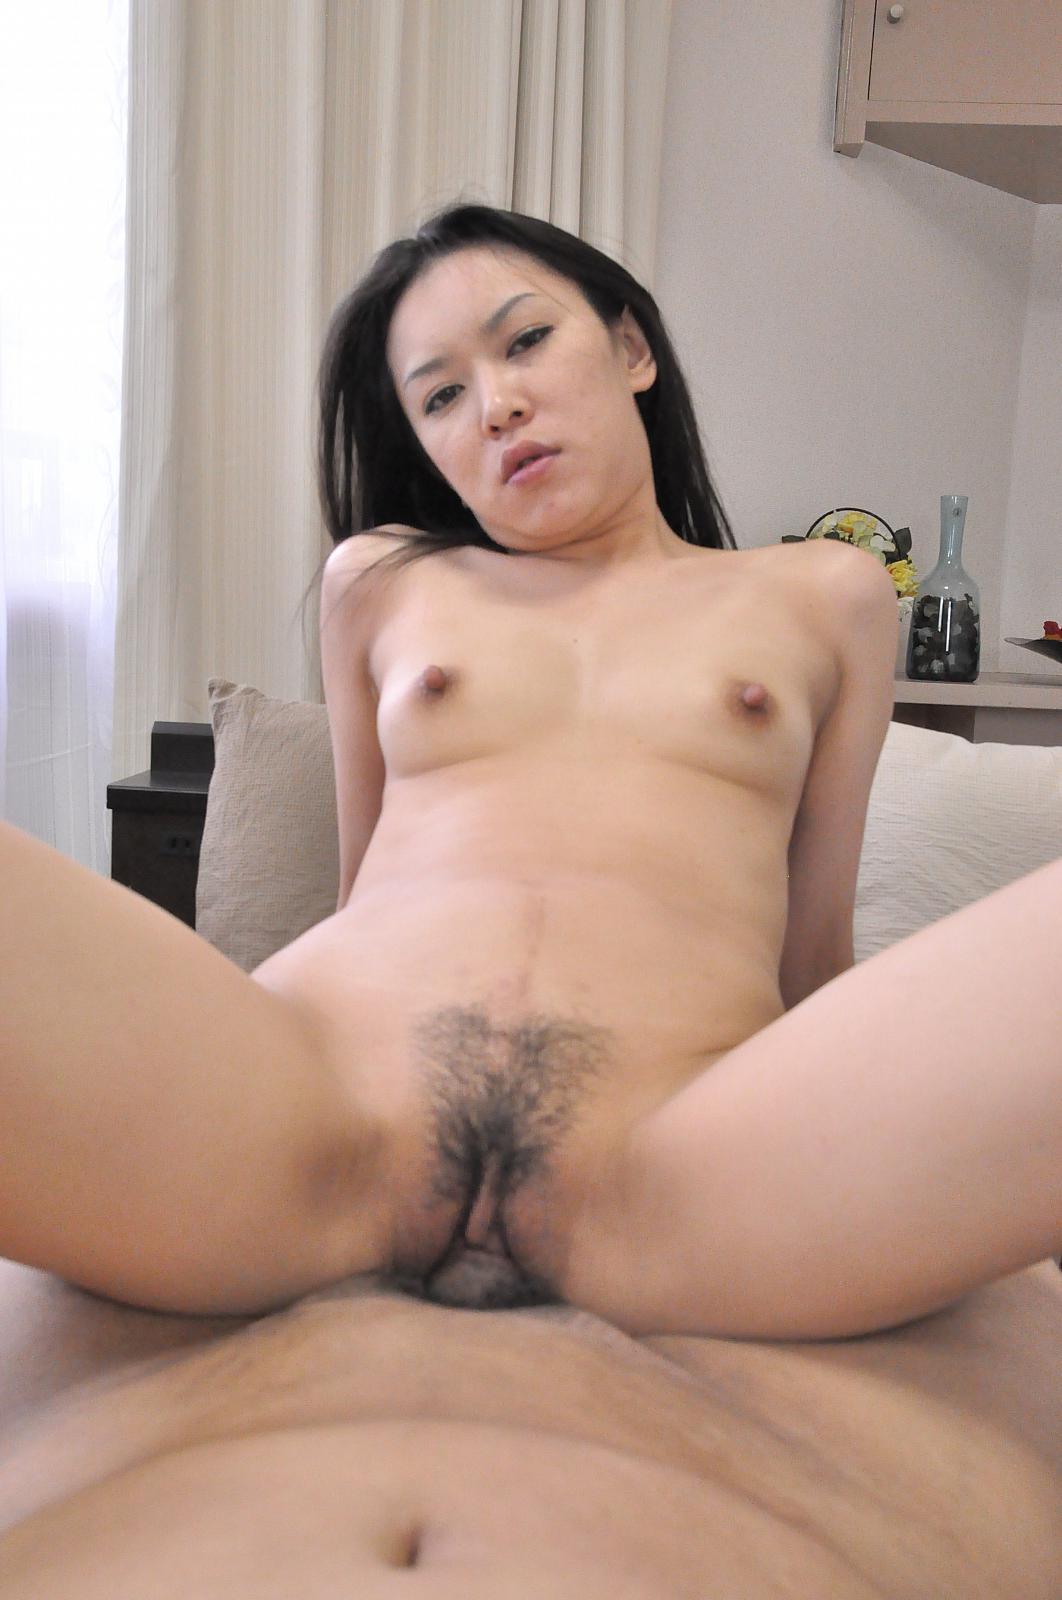 Japanese milf yuriko hiratsuka eager for some hardcore sex 9